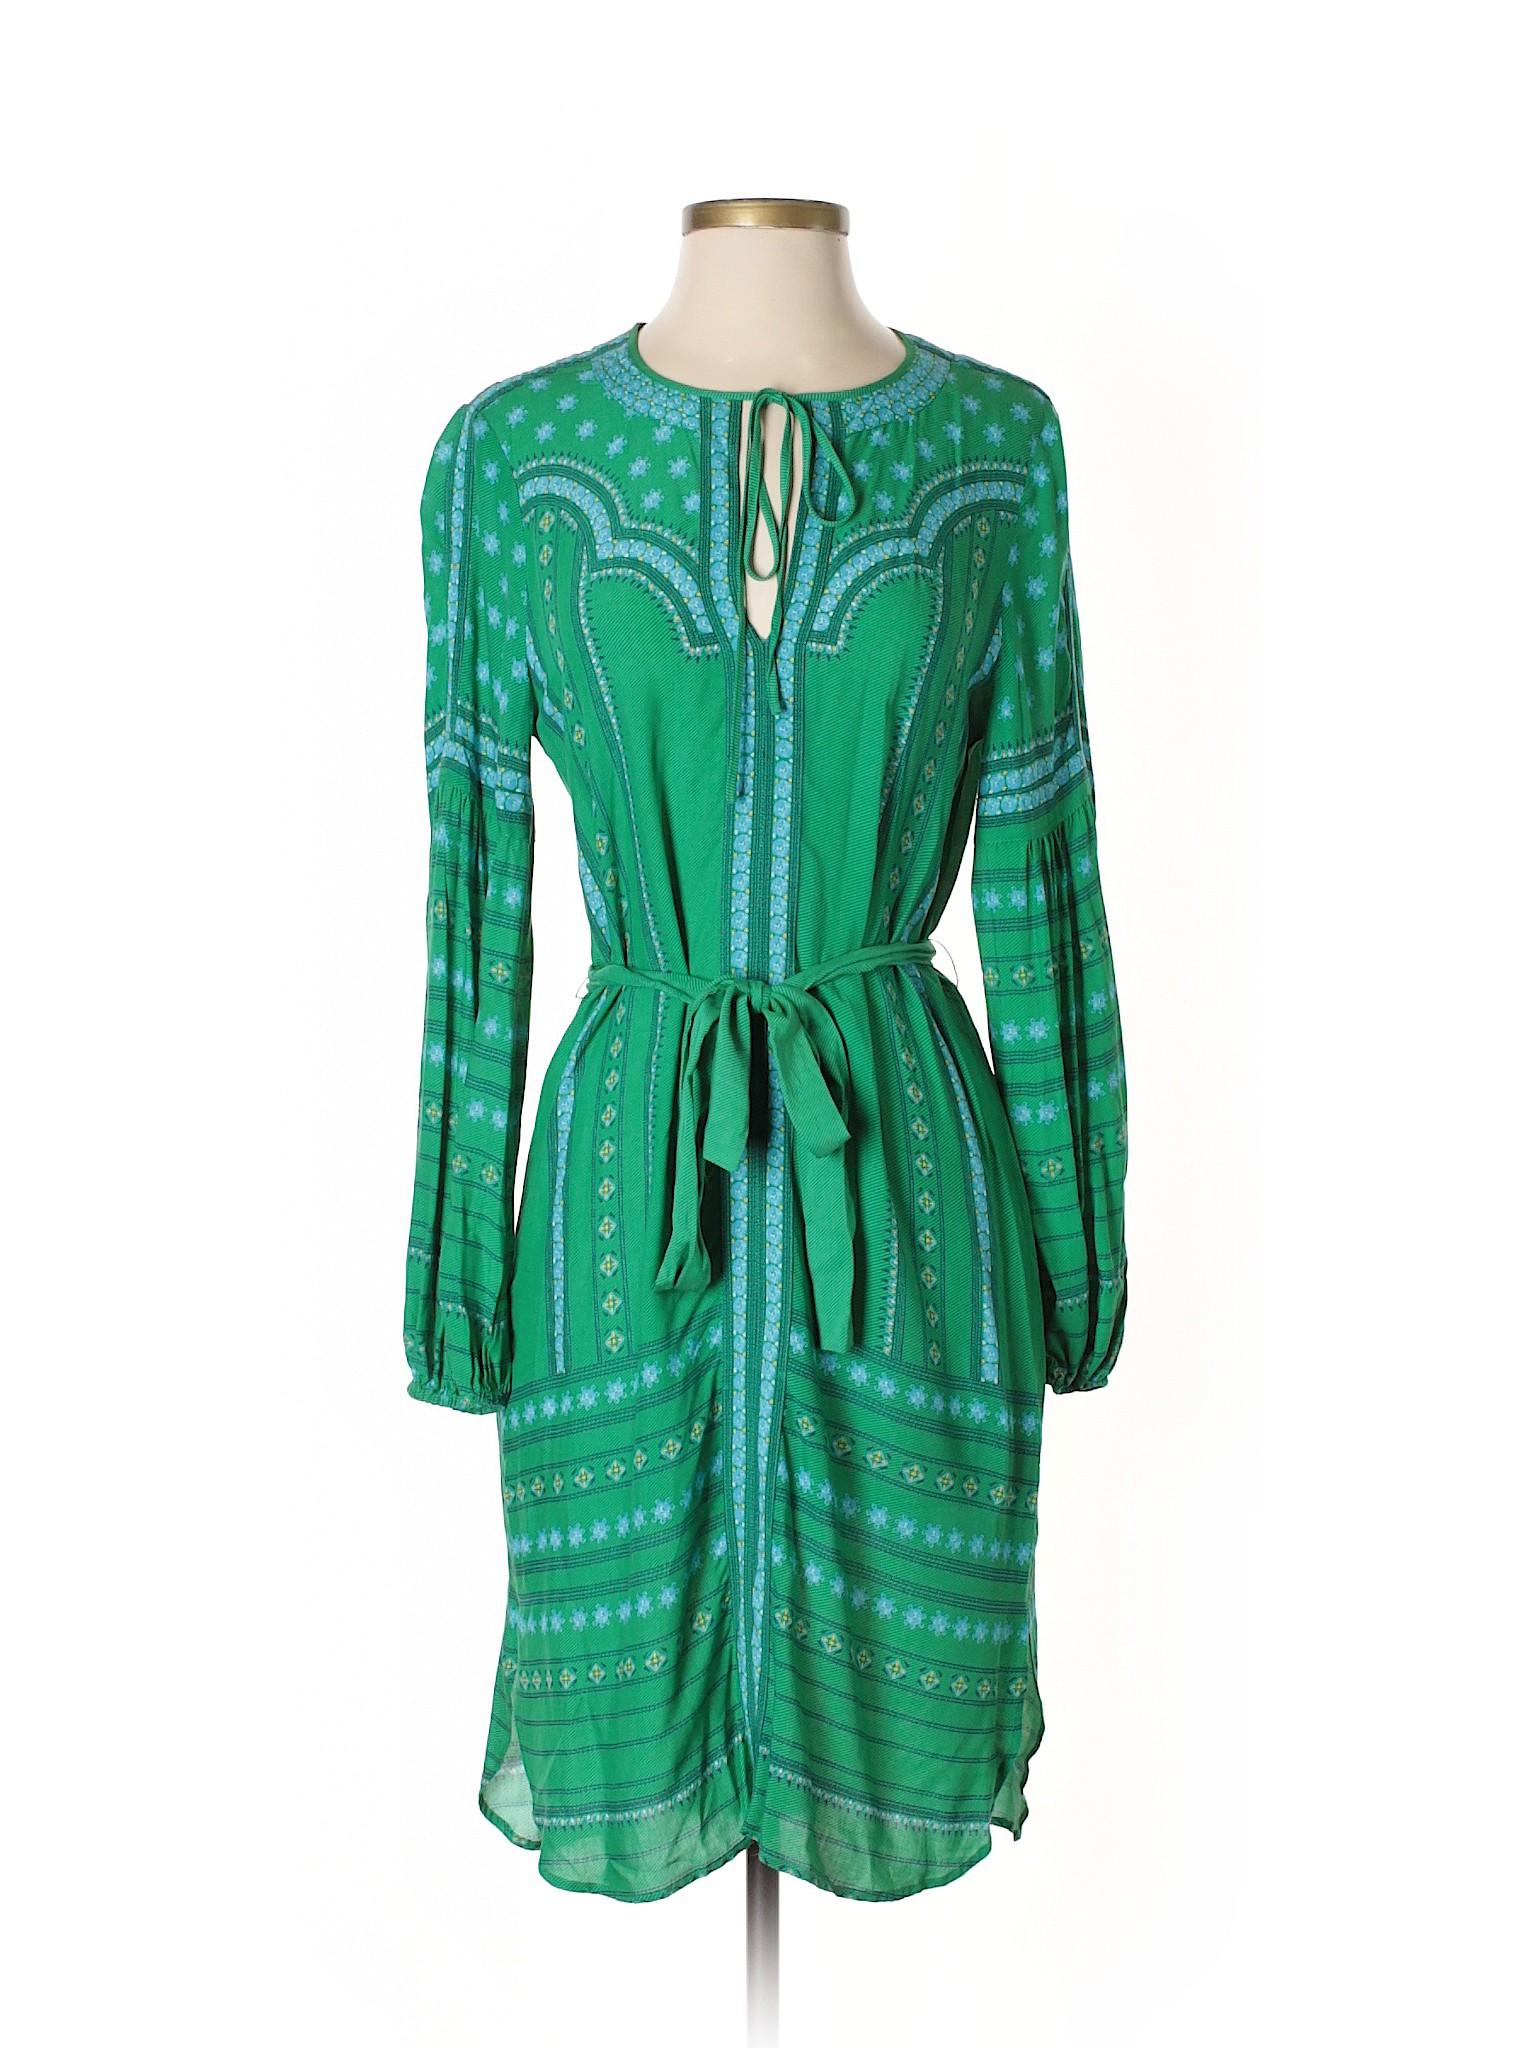 BCBGMAXAZRIA Casual Selling Casual BCBGMAXAZRIA Selling Dress Dress Selling wFgaq4yT